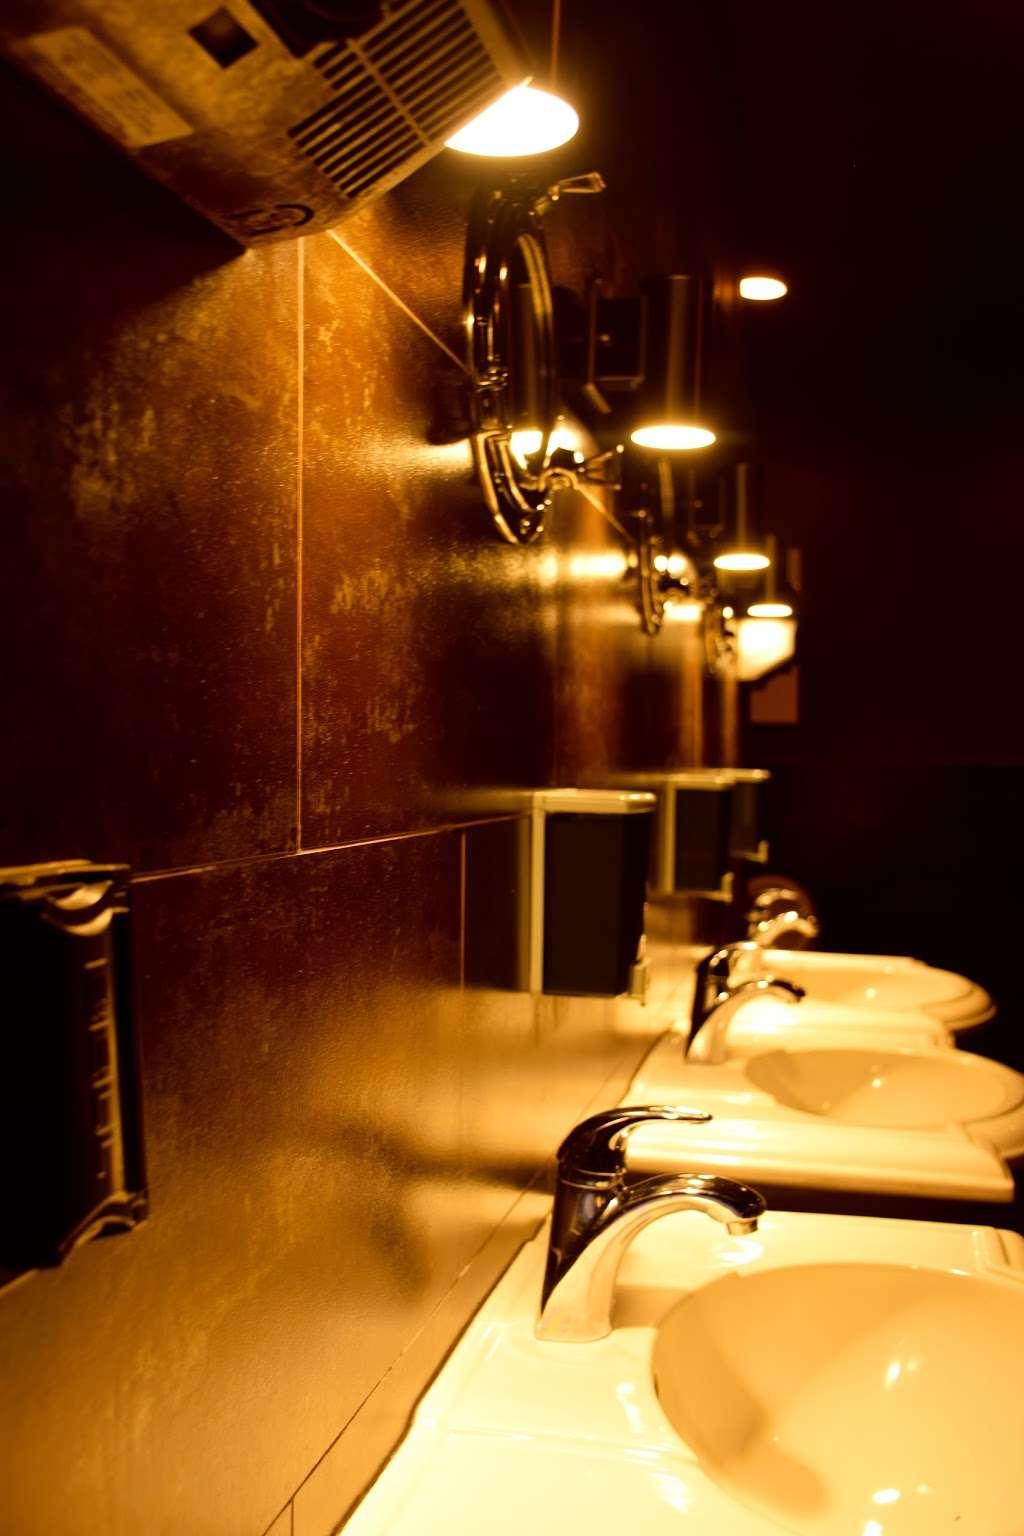 Crew Club - spa  | Photo 8 of 10 | Address: 1321 14th St NW, Washington, DC 20005, USA | Phone: (202) 319-1333